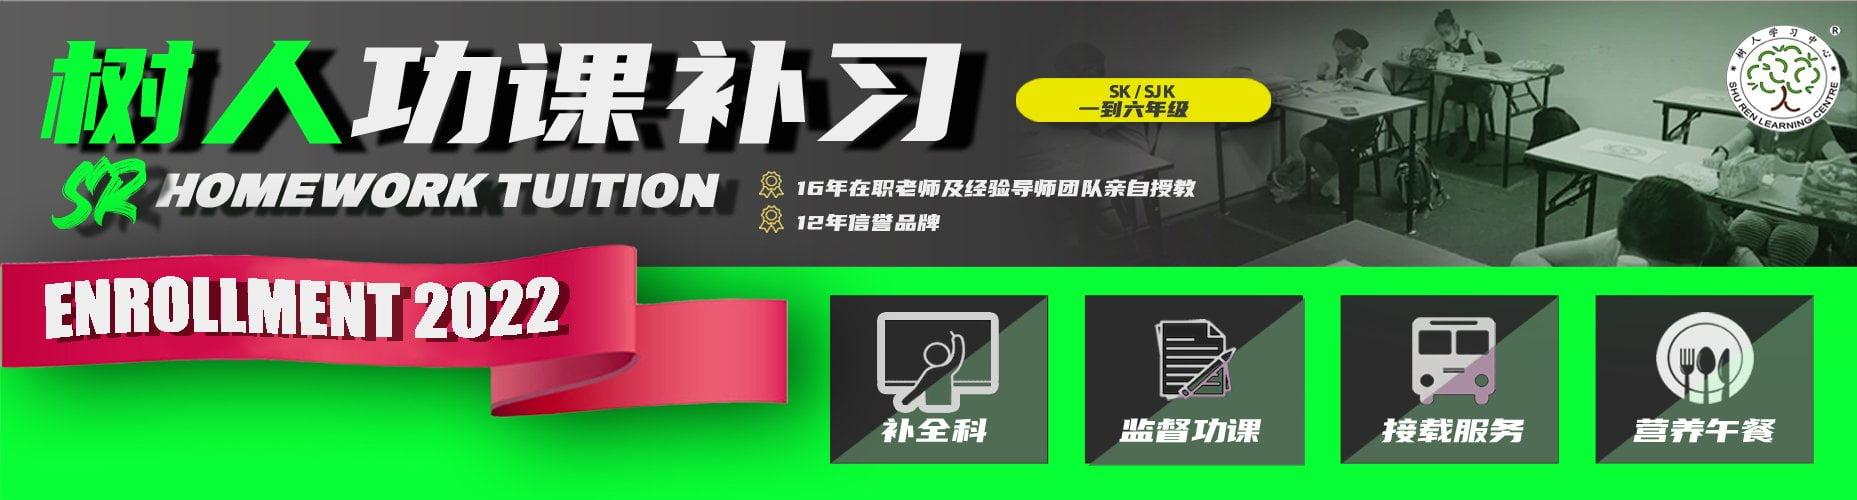 sr htc website